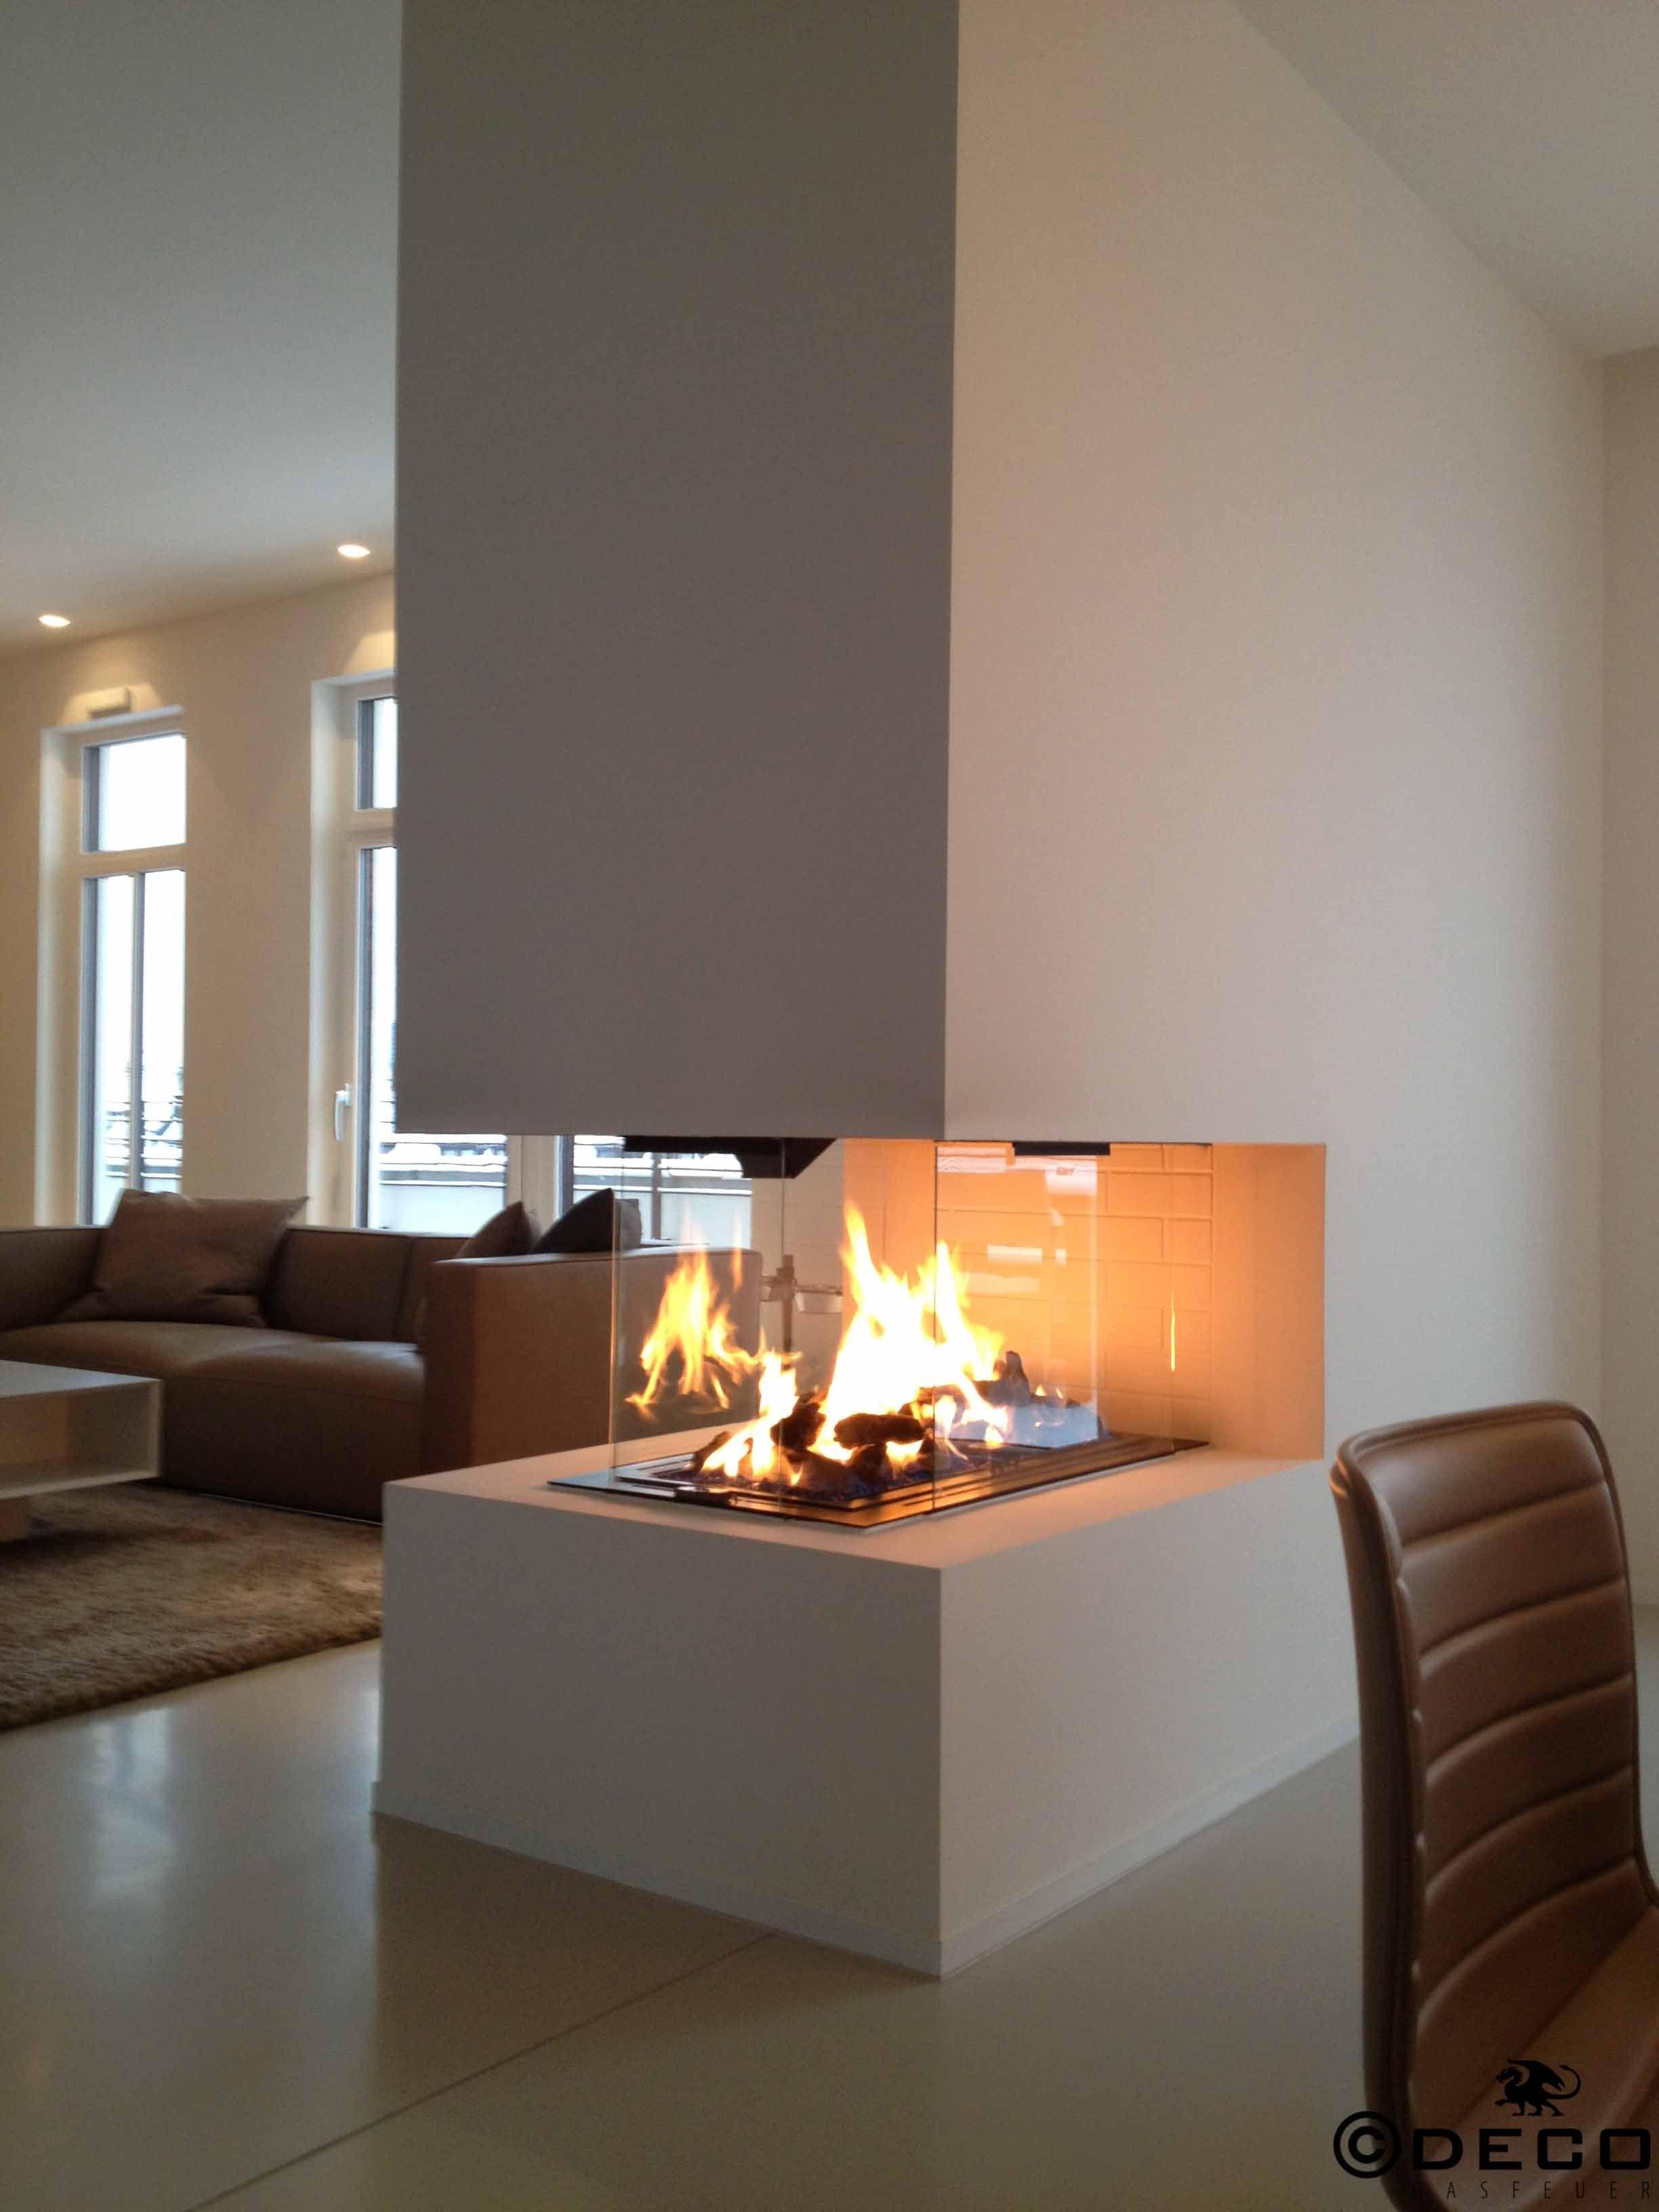 Gasfeuer Gas Fireplace Kamin Wohnzimmer Gaskamin Kaminbau